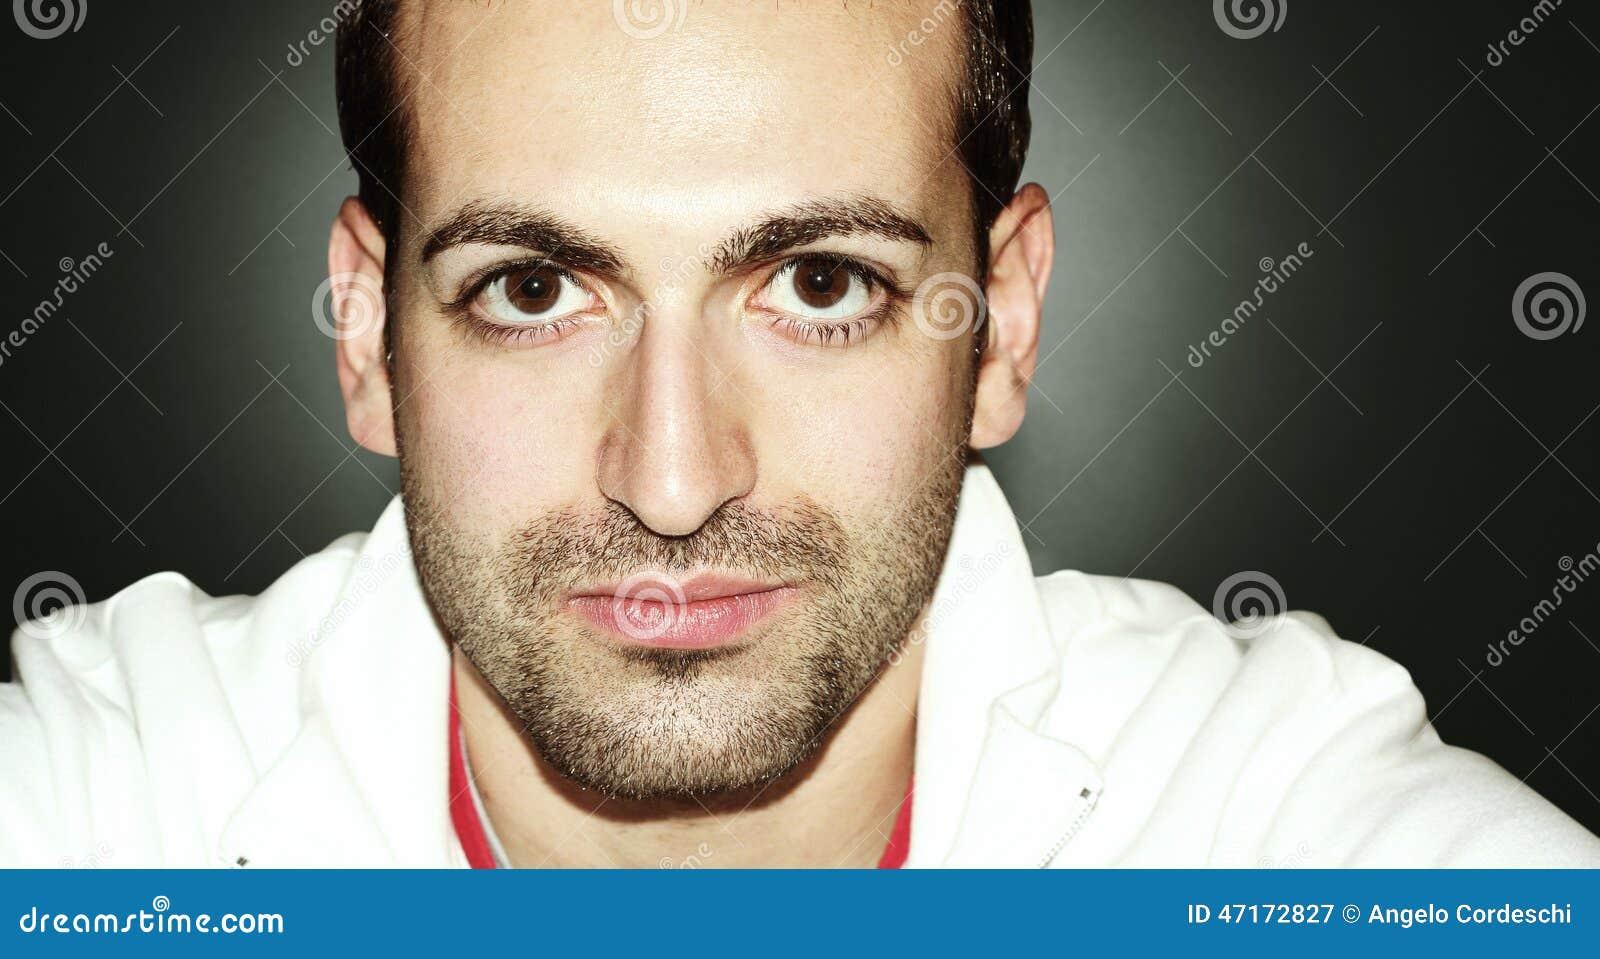 man with big eyes and beard horizontal portrait on grandient